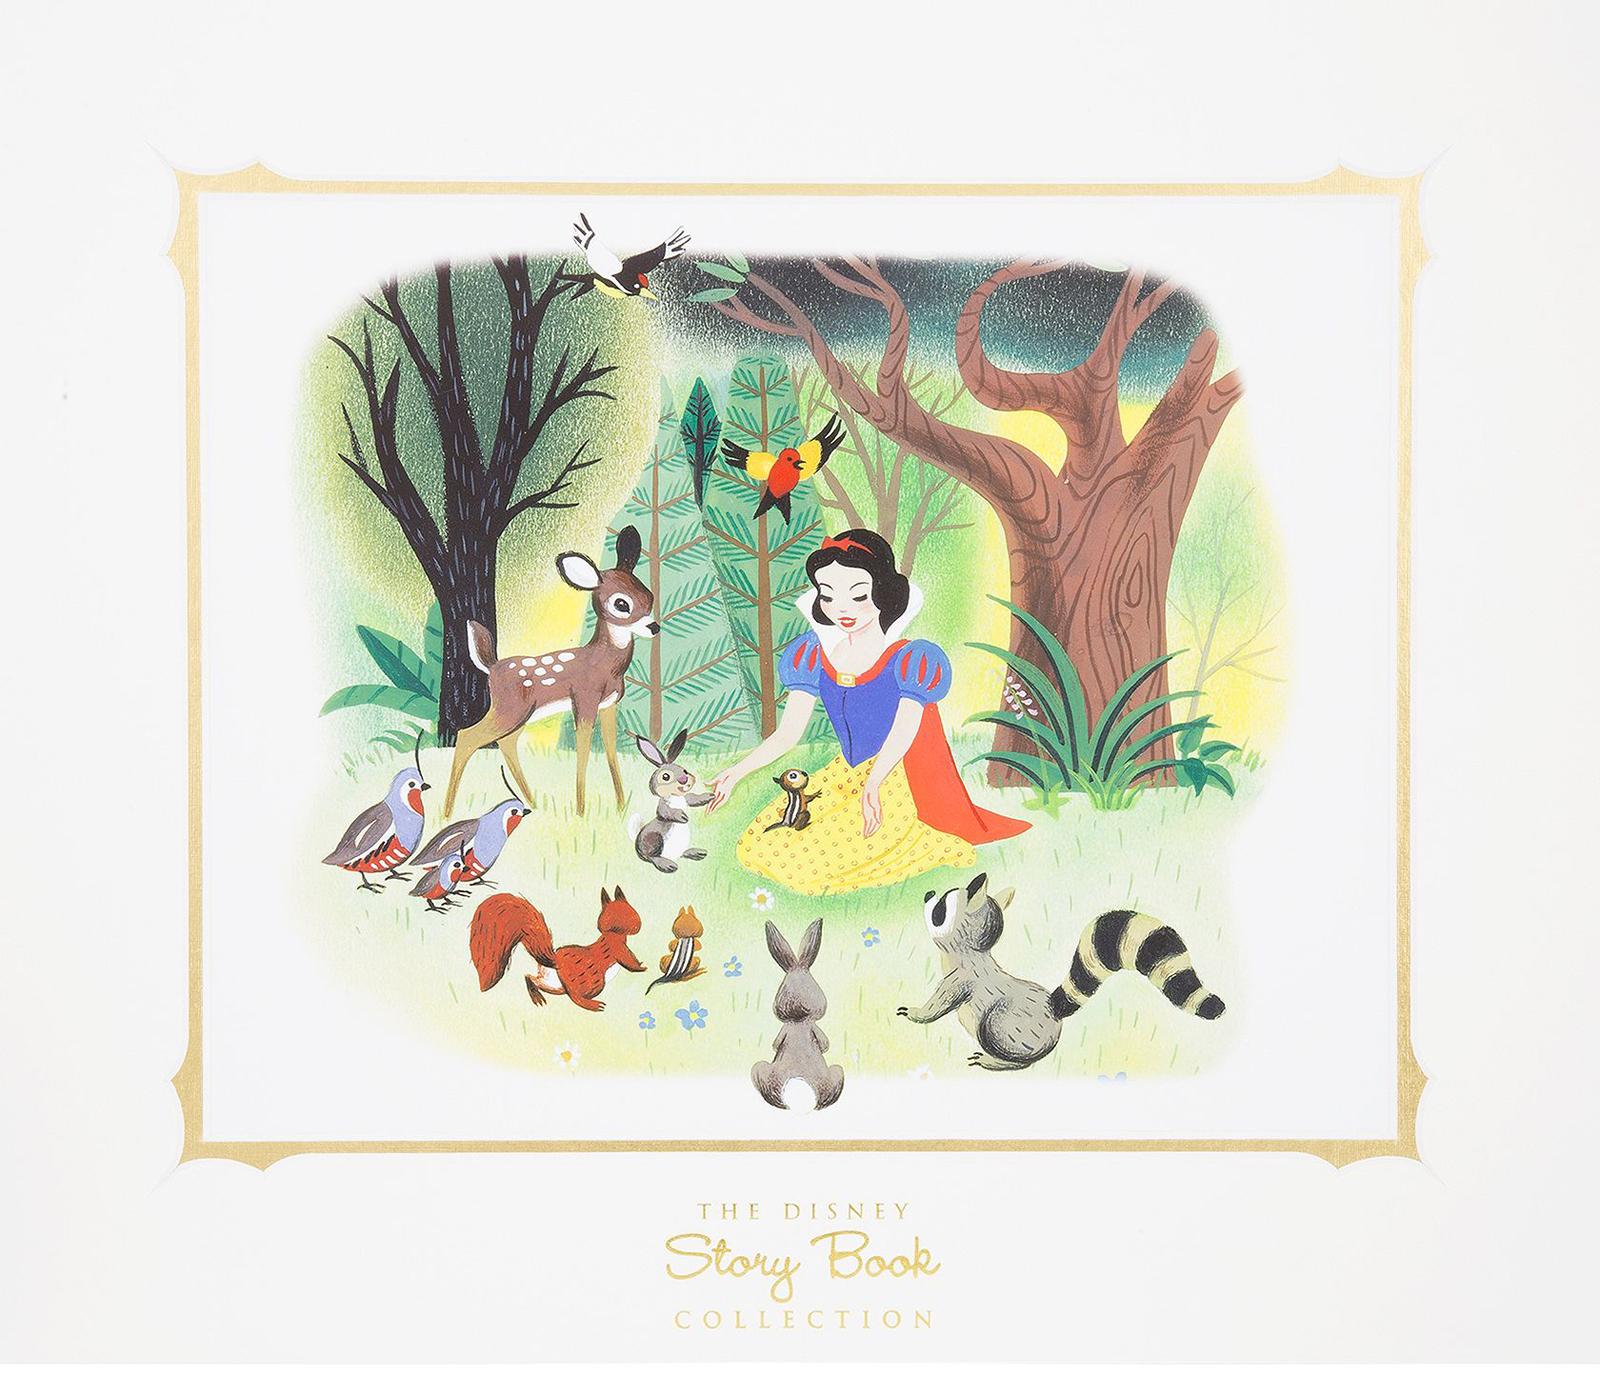 e391754a9b Filmic Light - Snow White Archive  2015 Snow White Art Print (from ...